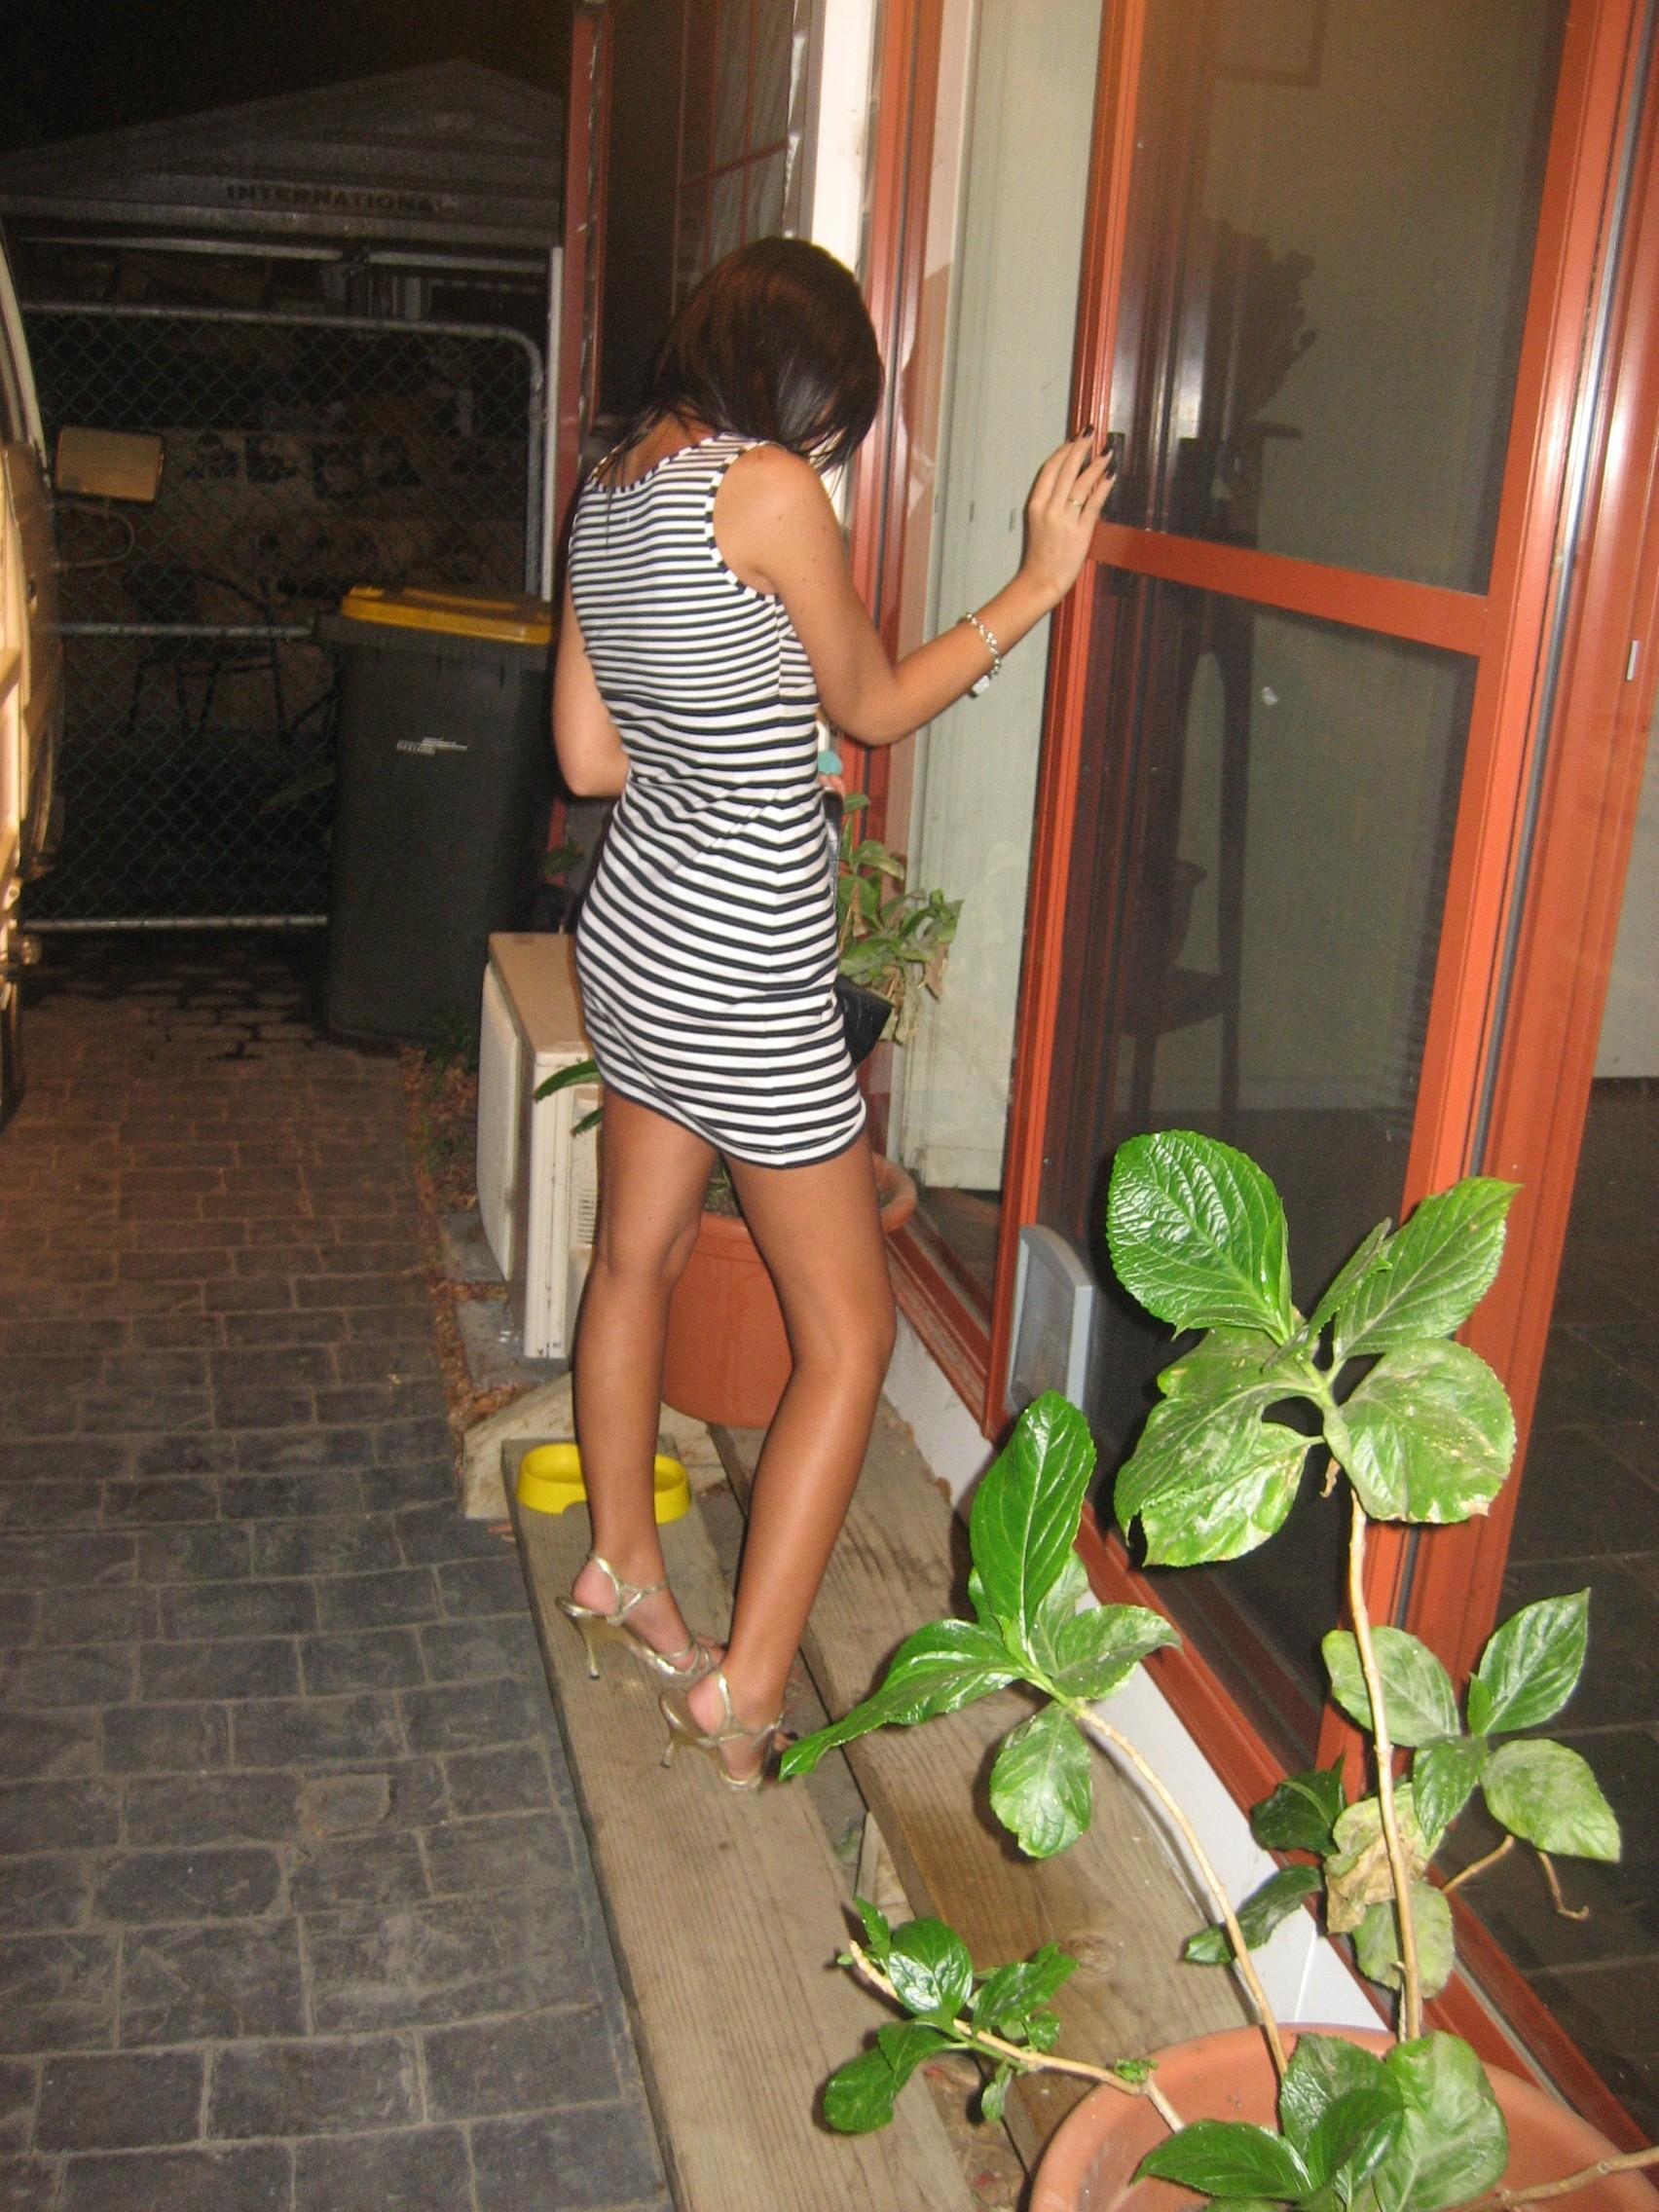 tanned-amateur-girl-slim-body-naked-01